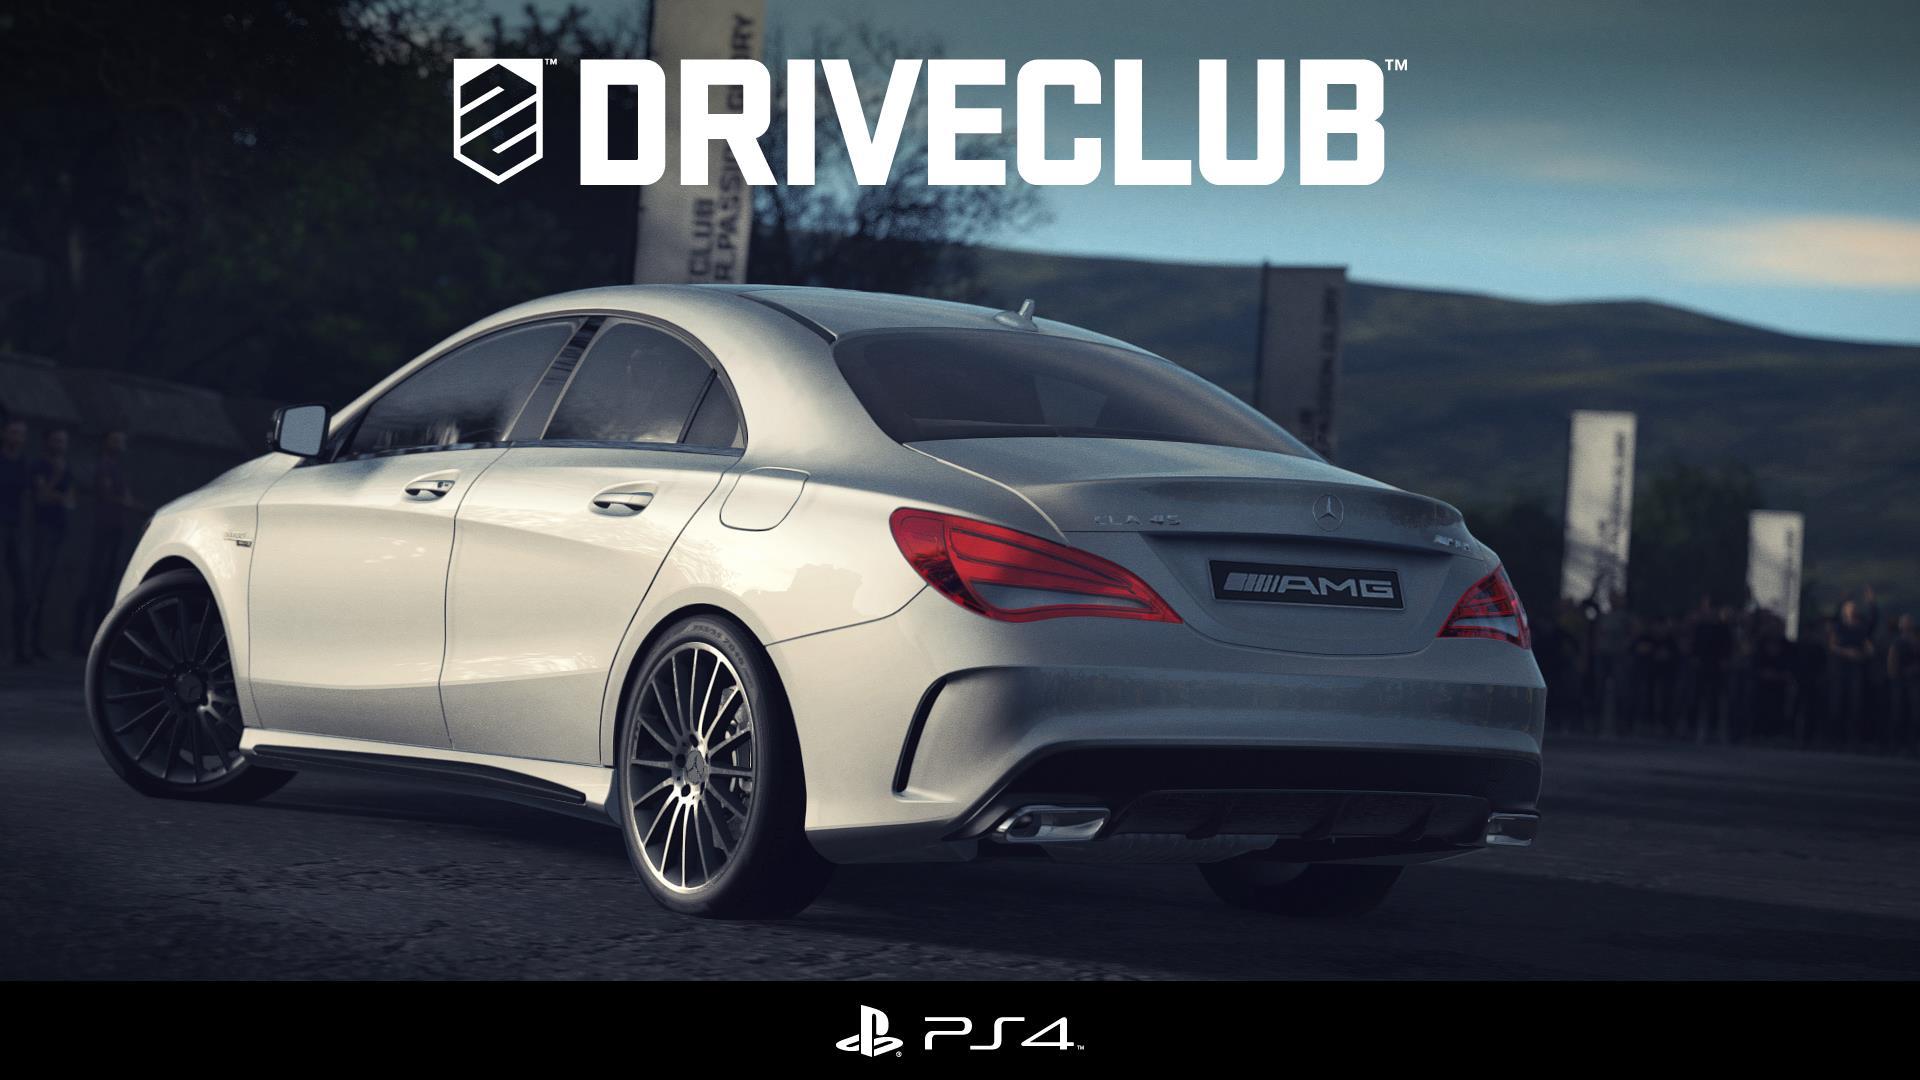 driveclub_screenshot1